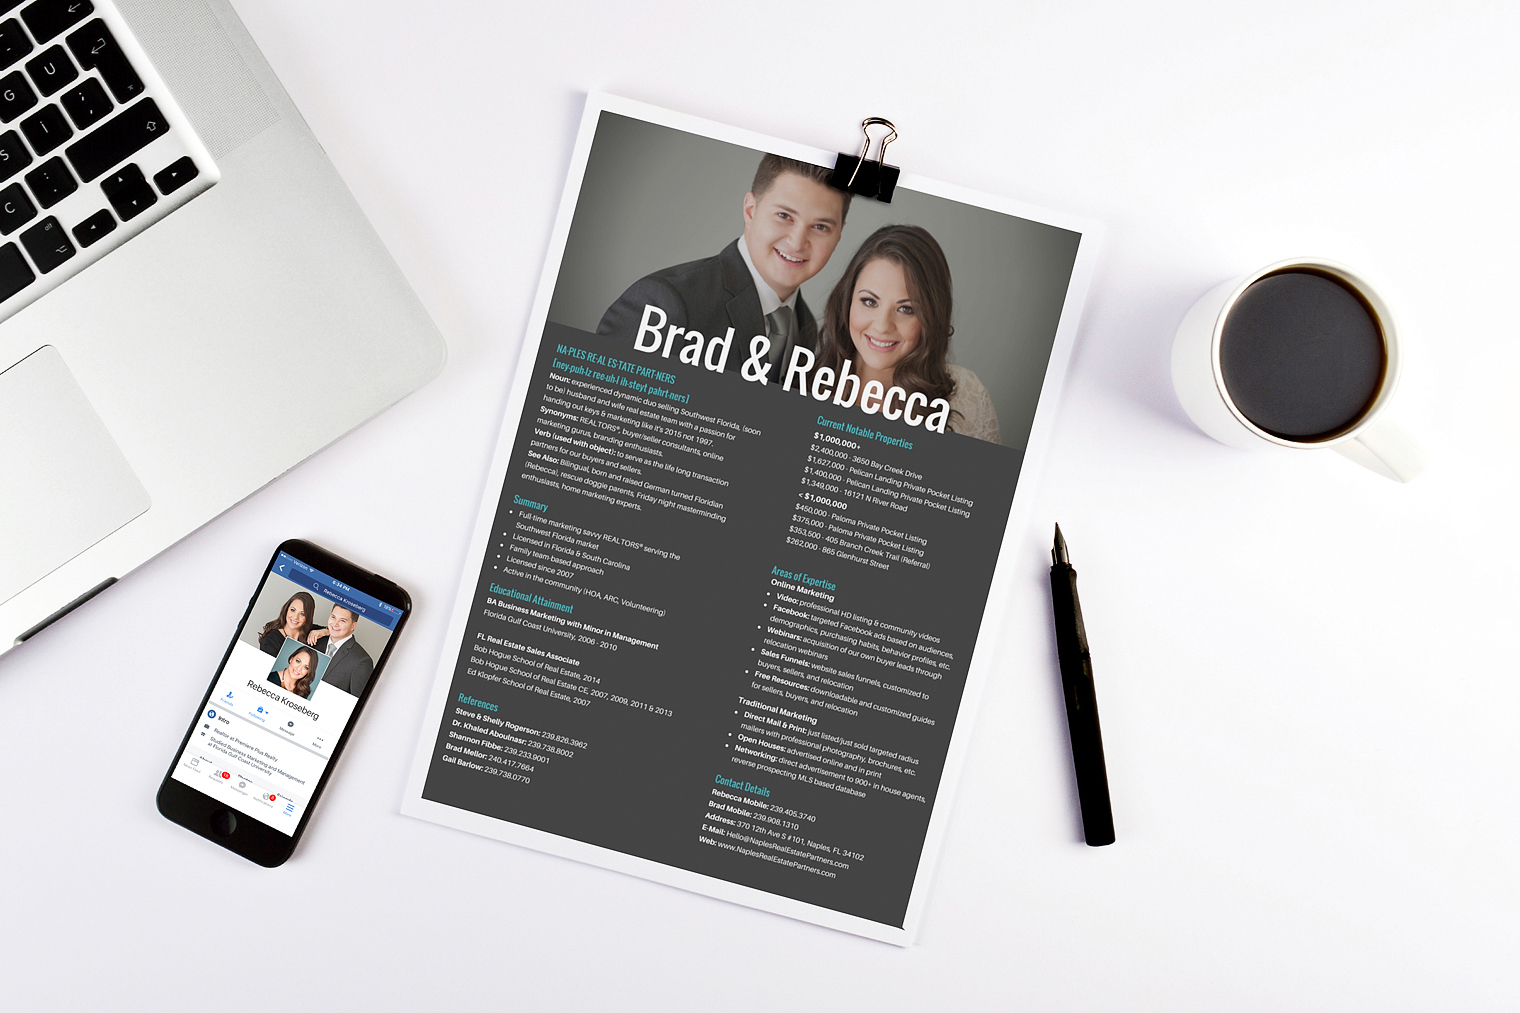 05-social-media-handshake-marketing-uses2.jpg